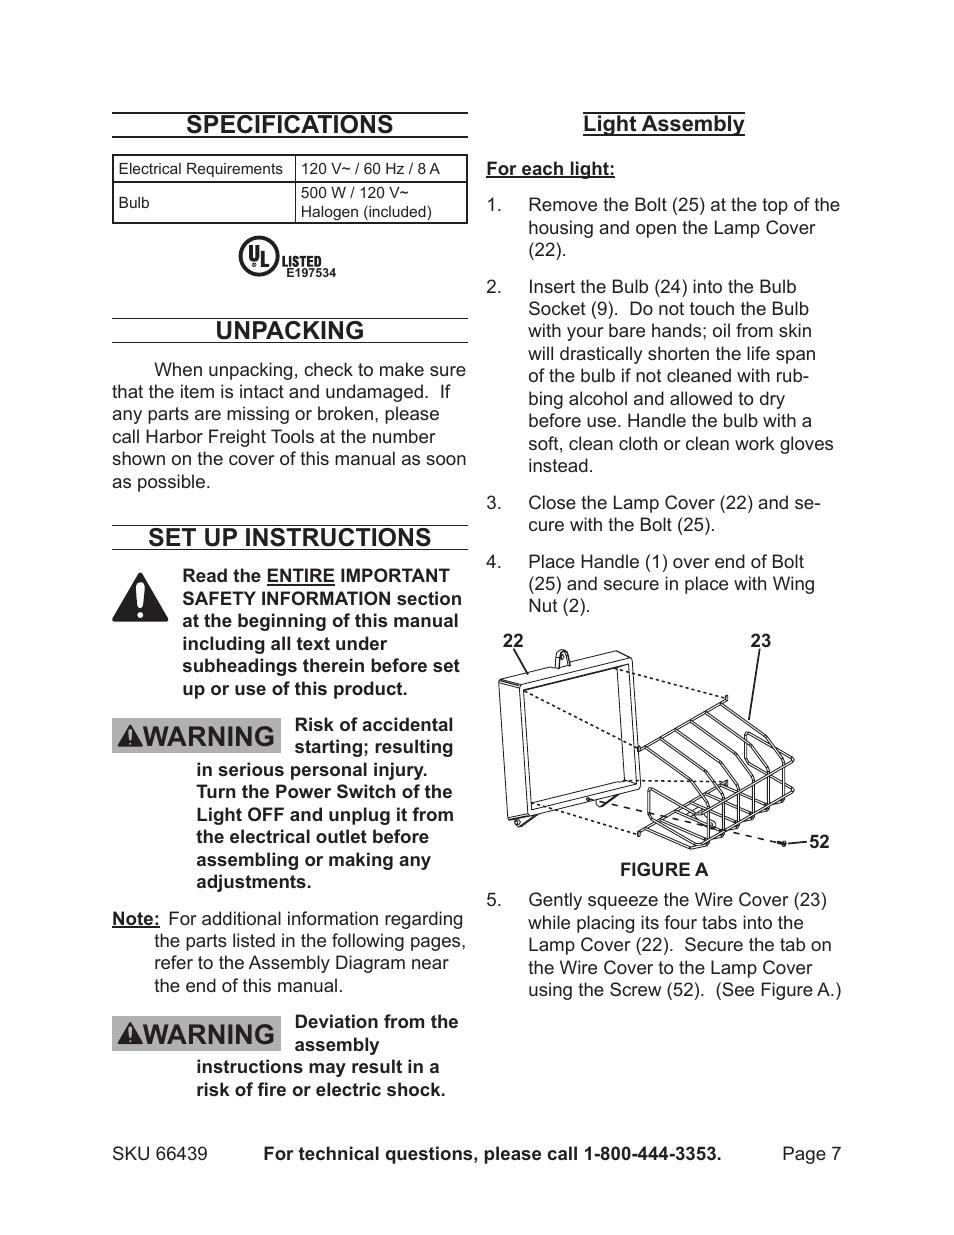 Warning Specifications Unpacking Chicago Electric 500 Watt Twin Warn Halogen Light Wiring Diagram Tripod 66439 User Manual Page 7 12